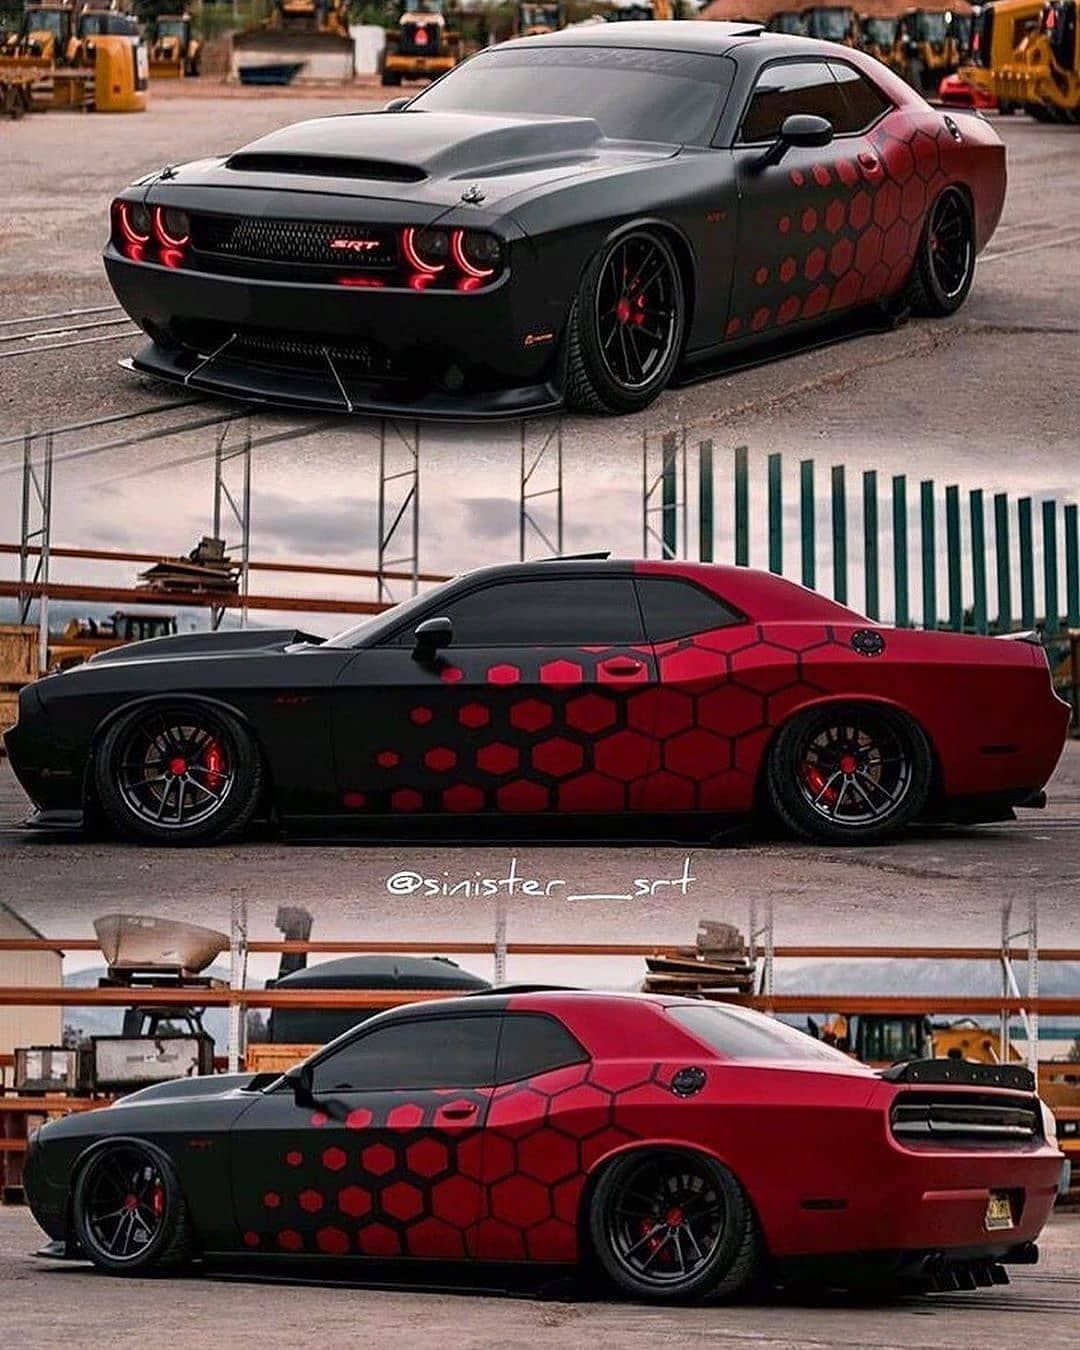 Pin By Rose On 3 9 In 2020 Dodge Challenger Urheiluautot Hienot Autot